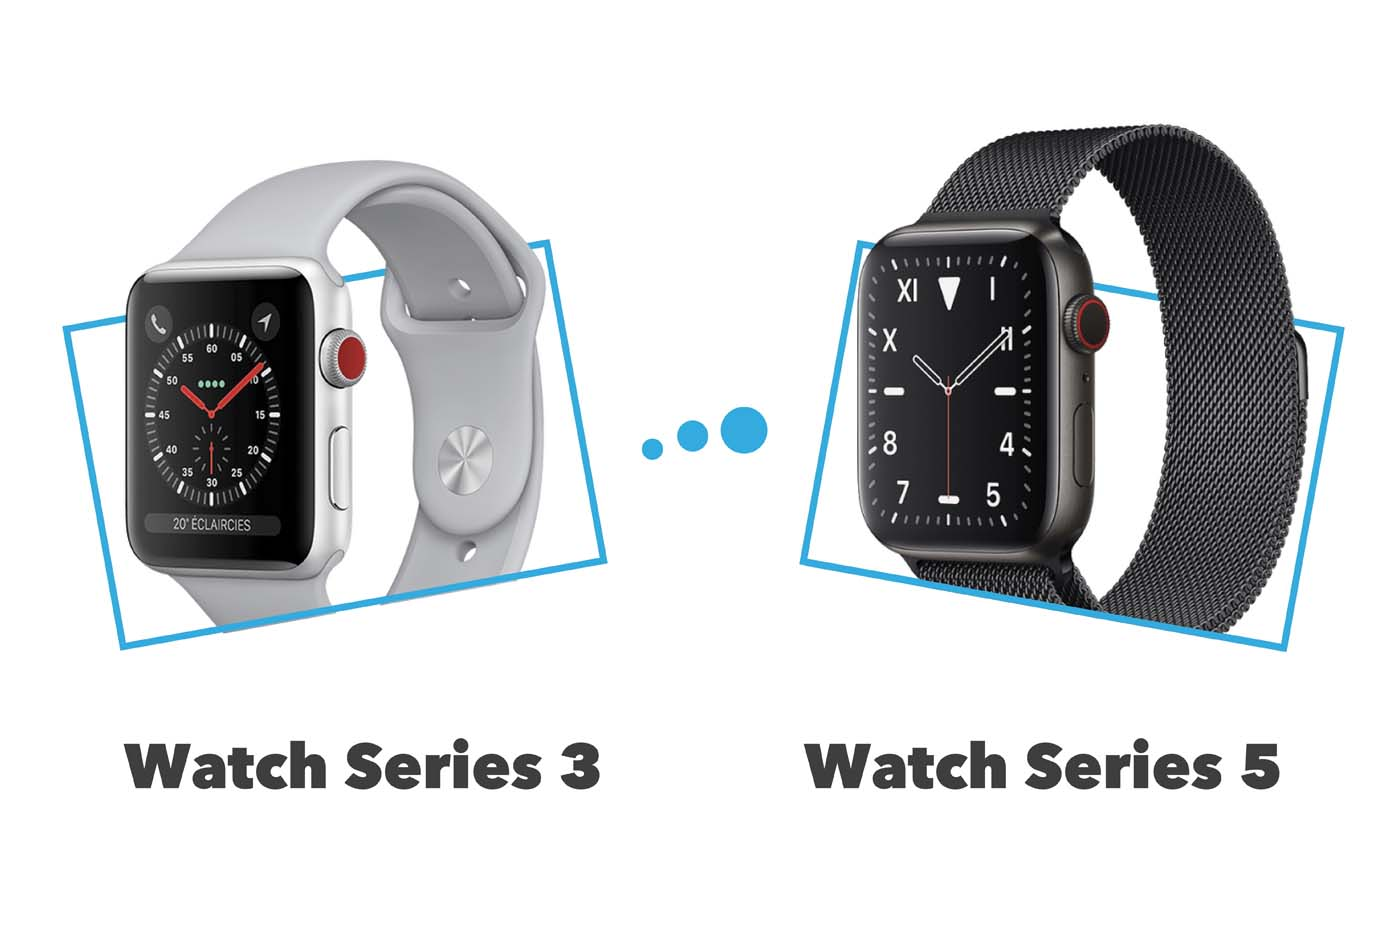 Comparatif Apple Watch Series 3 vs Apple Watch Series 5